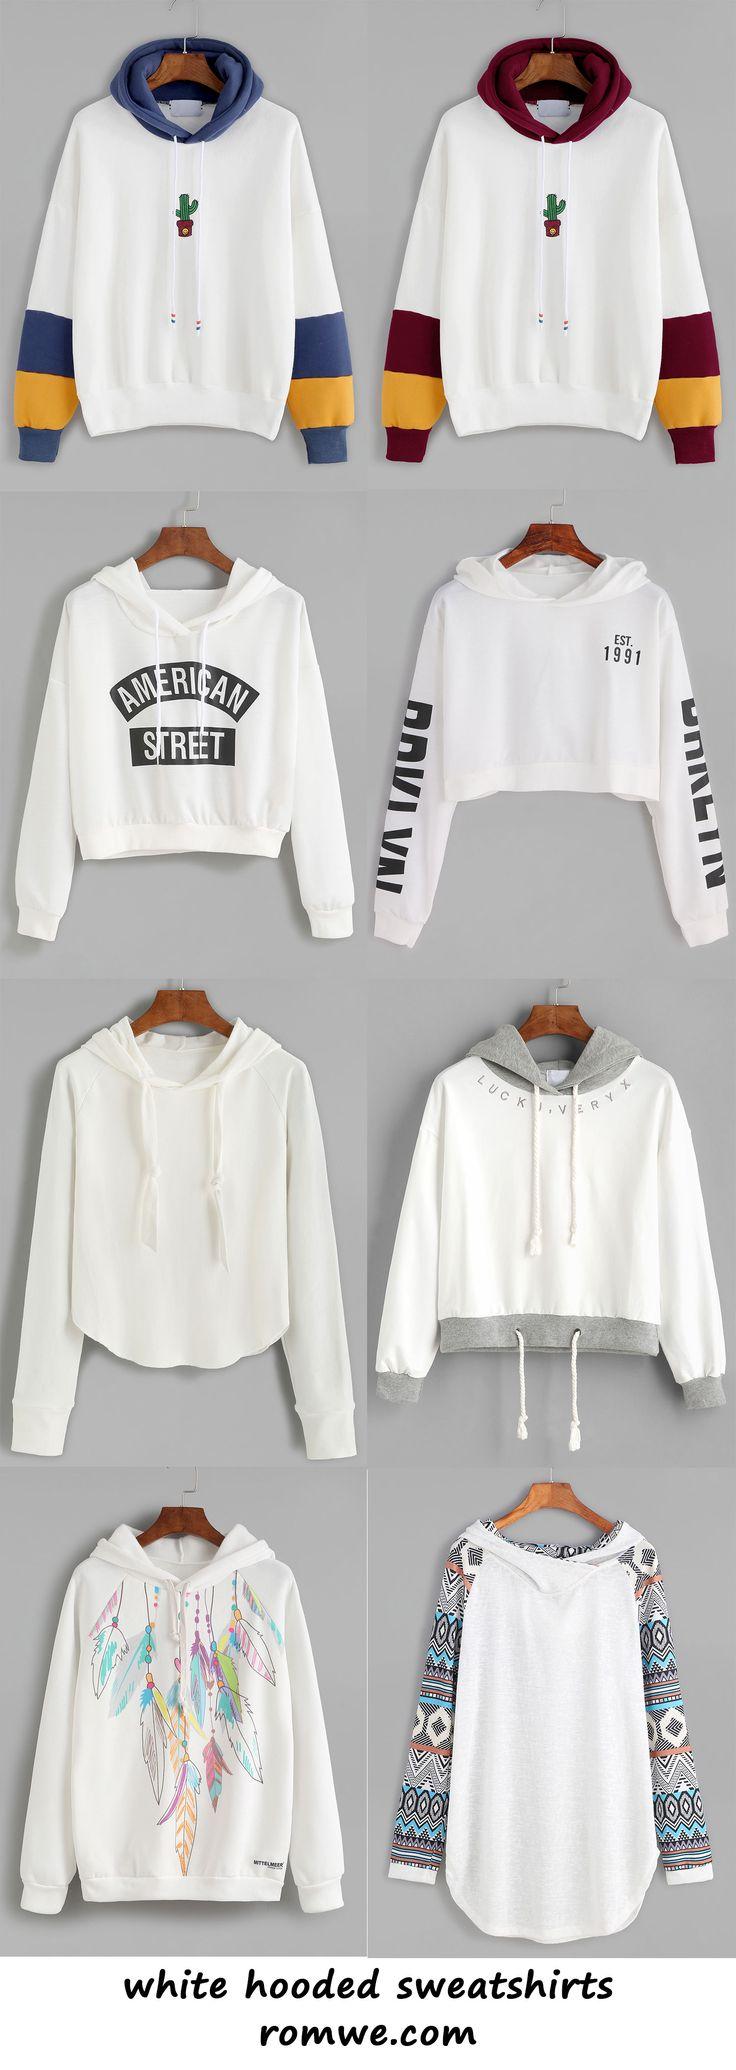 white hooded sweatshirts 2017 - romwe.com